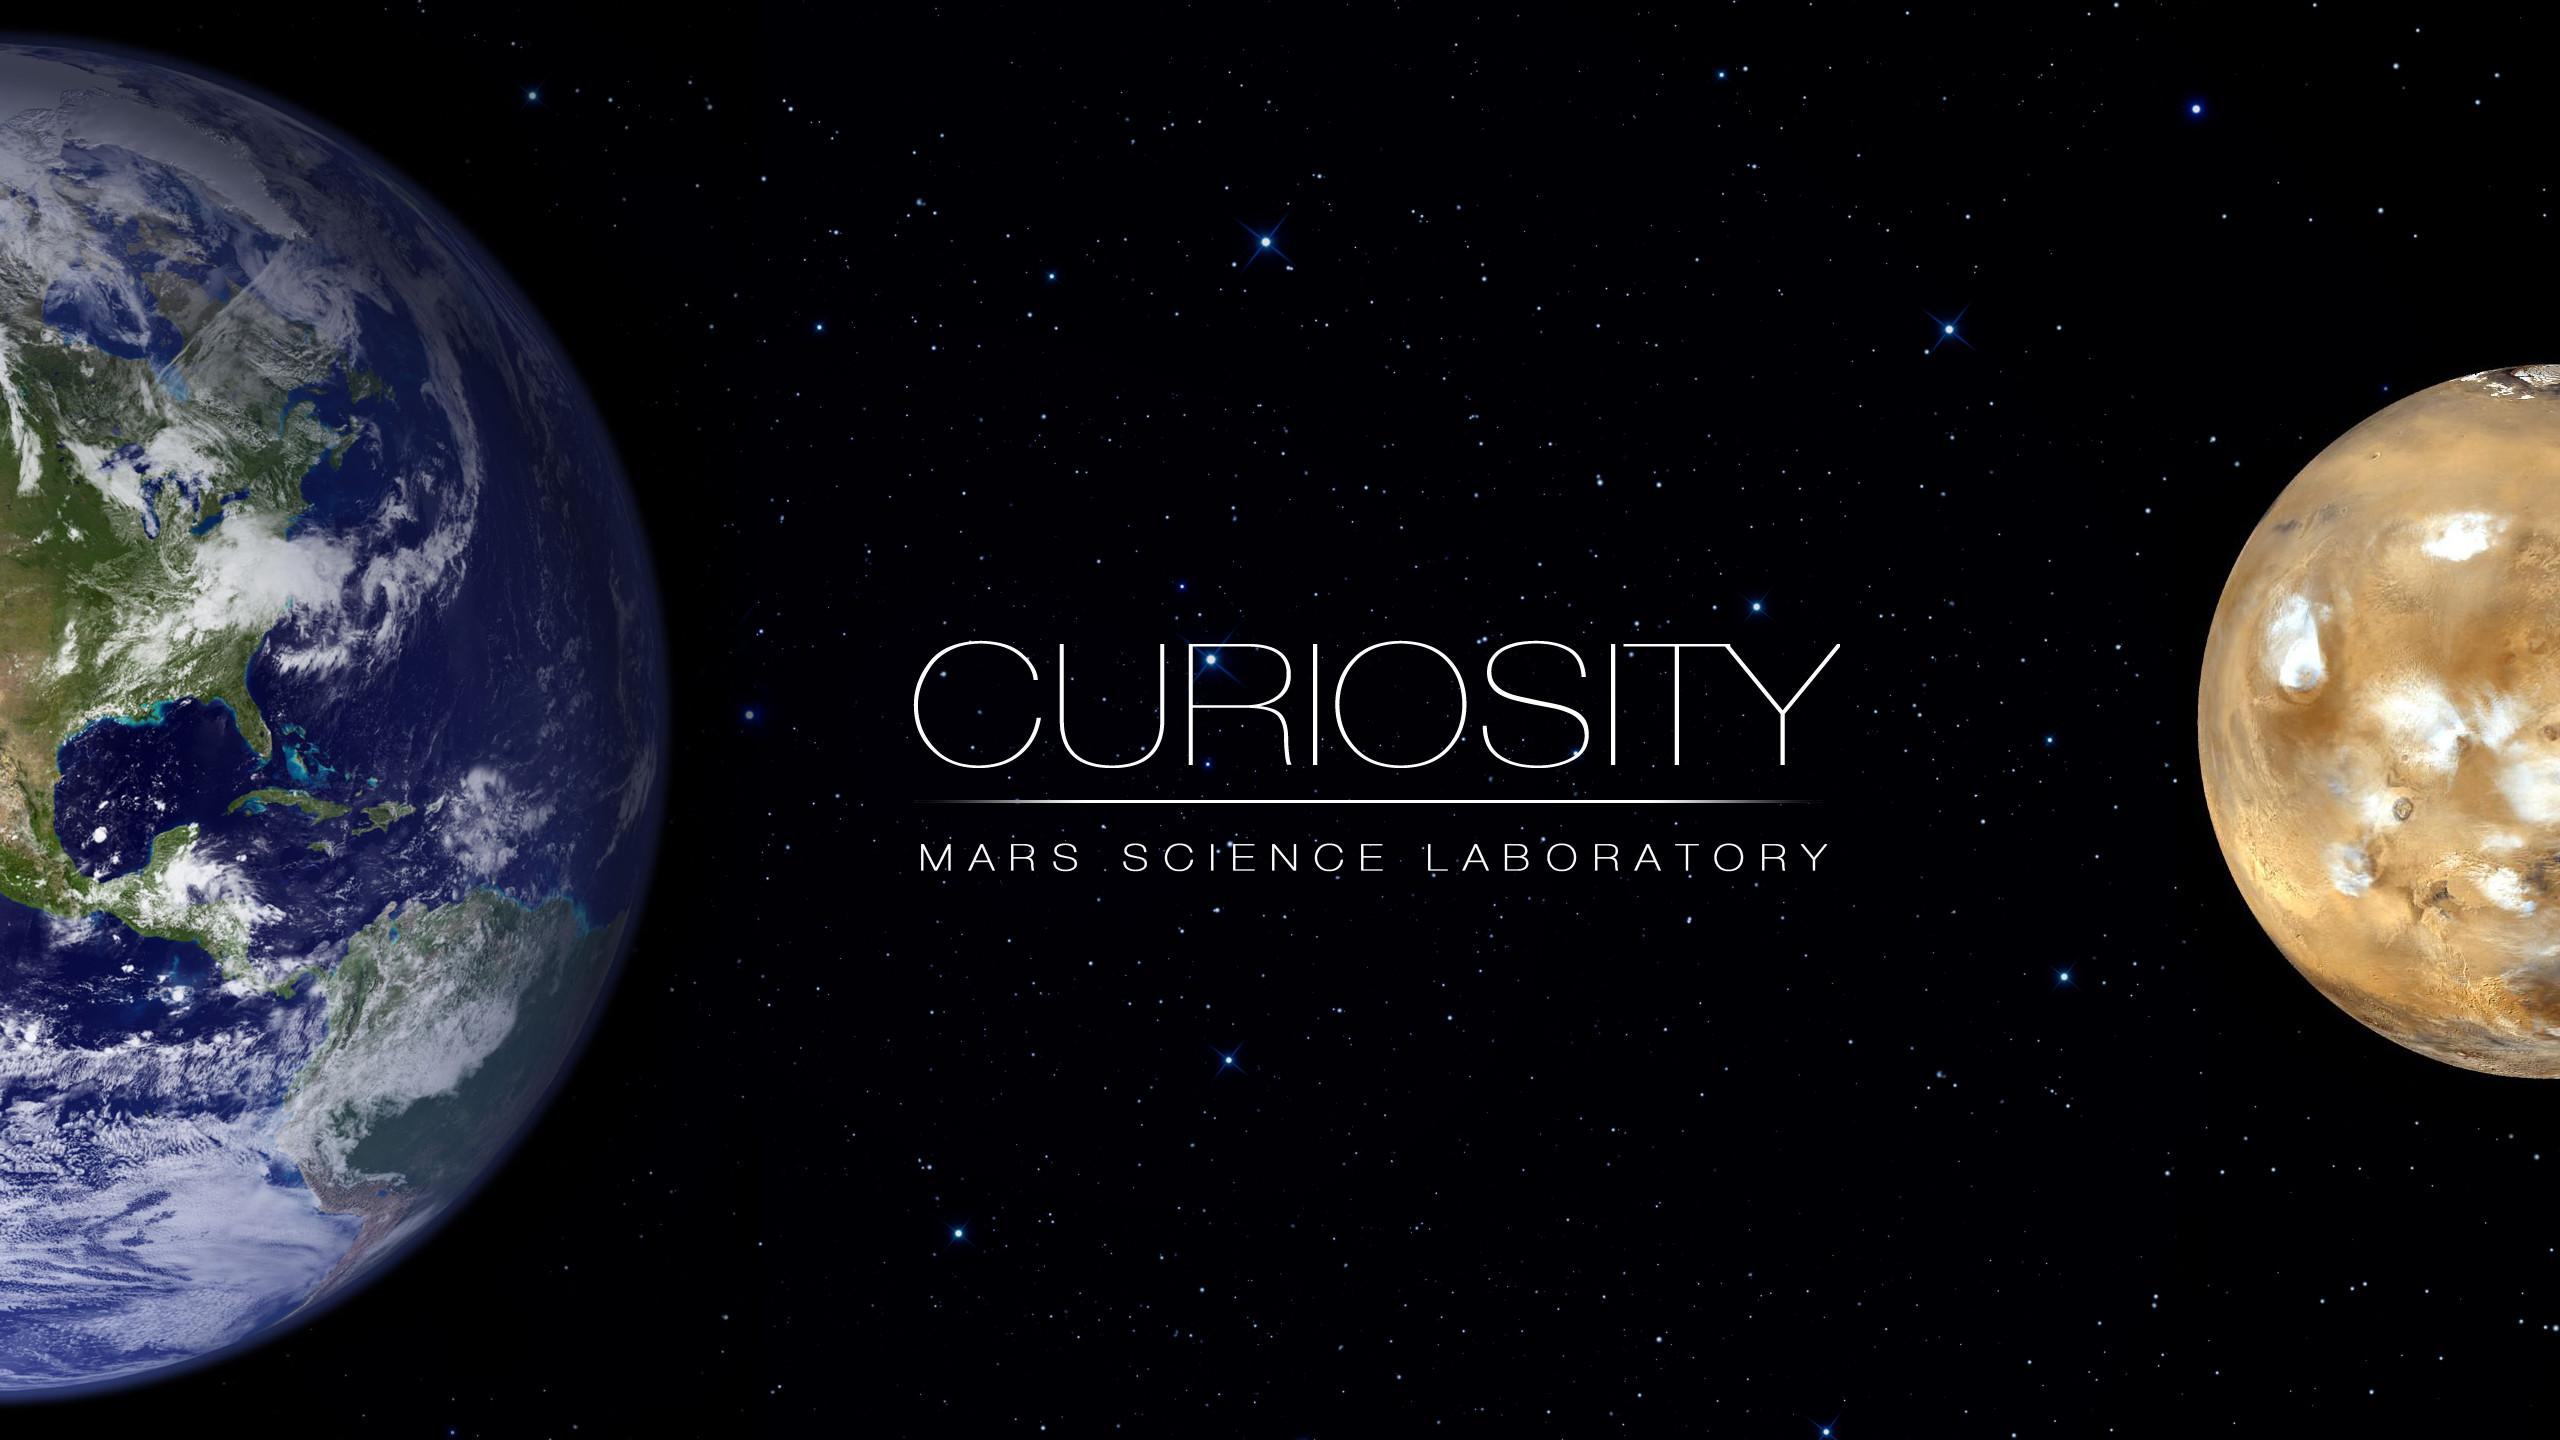 Curiosity Mars Science Laboratory / space wallpaper